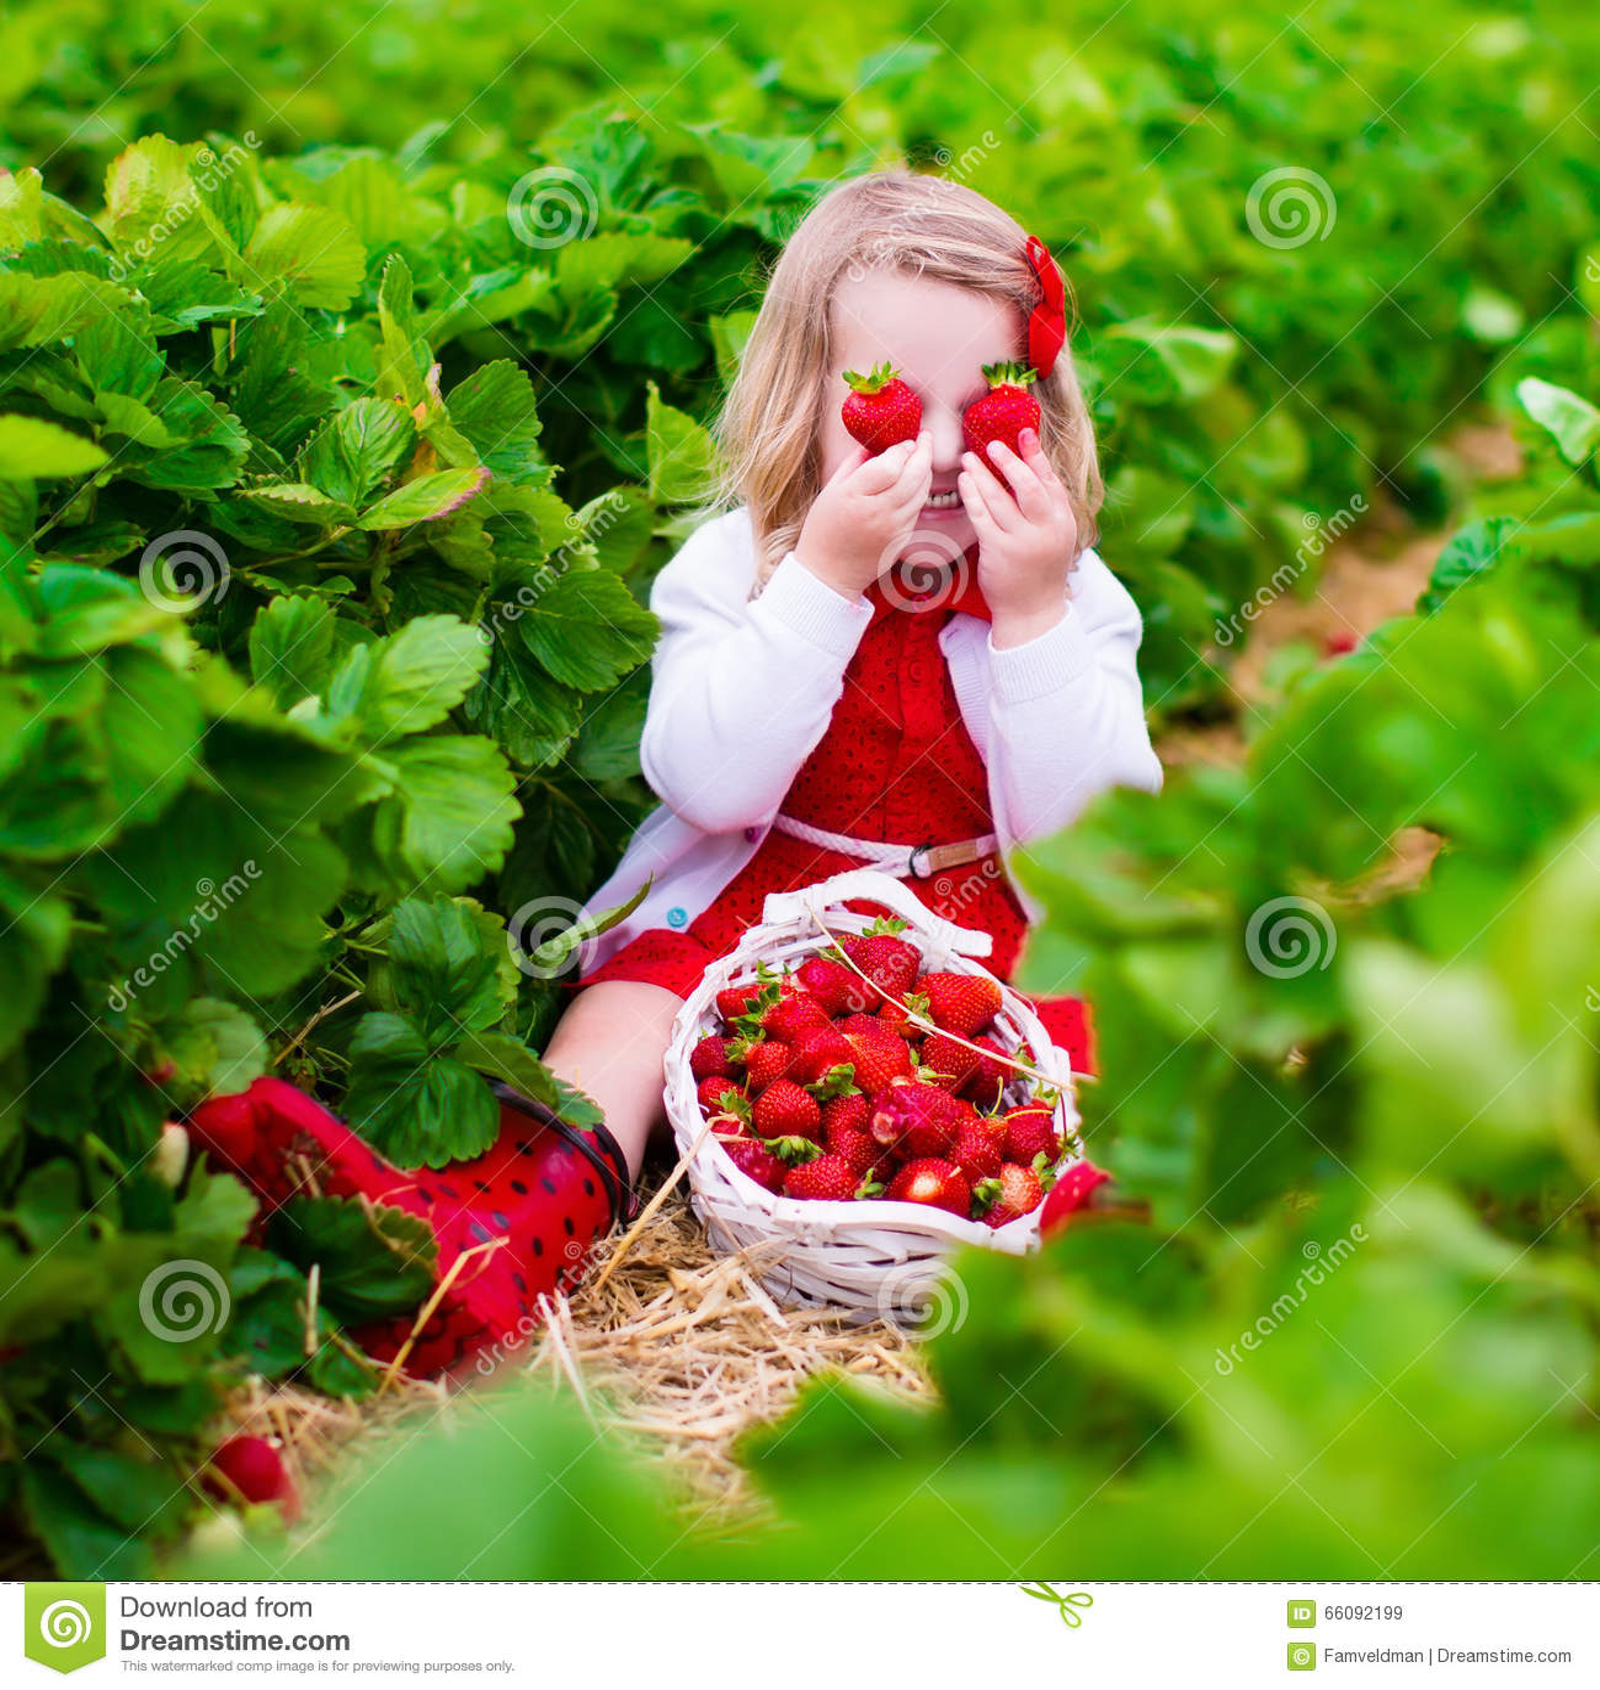 strawberry picking cartoon vector cartoondealer